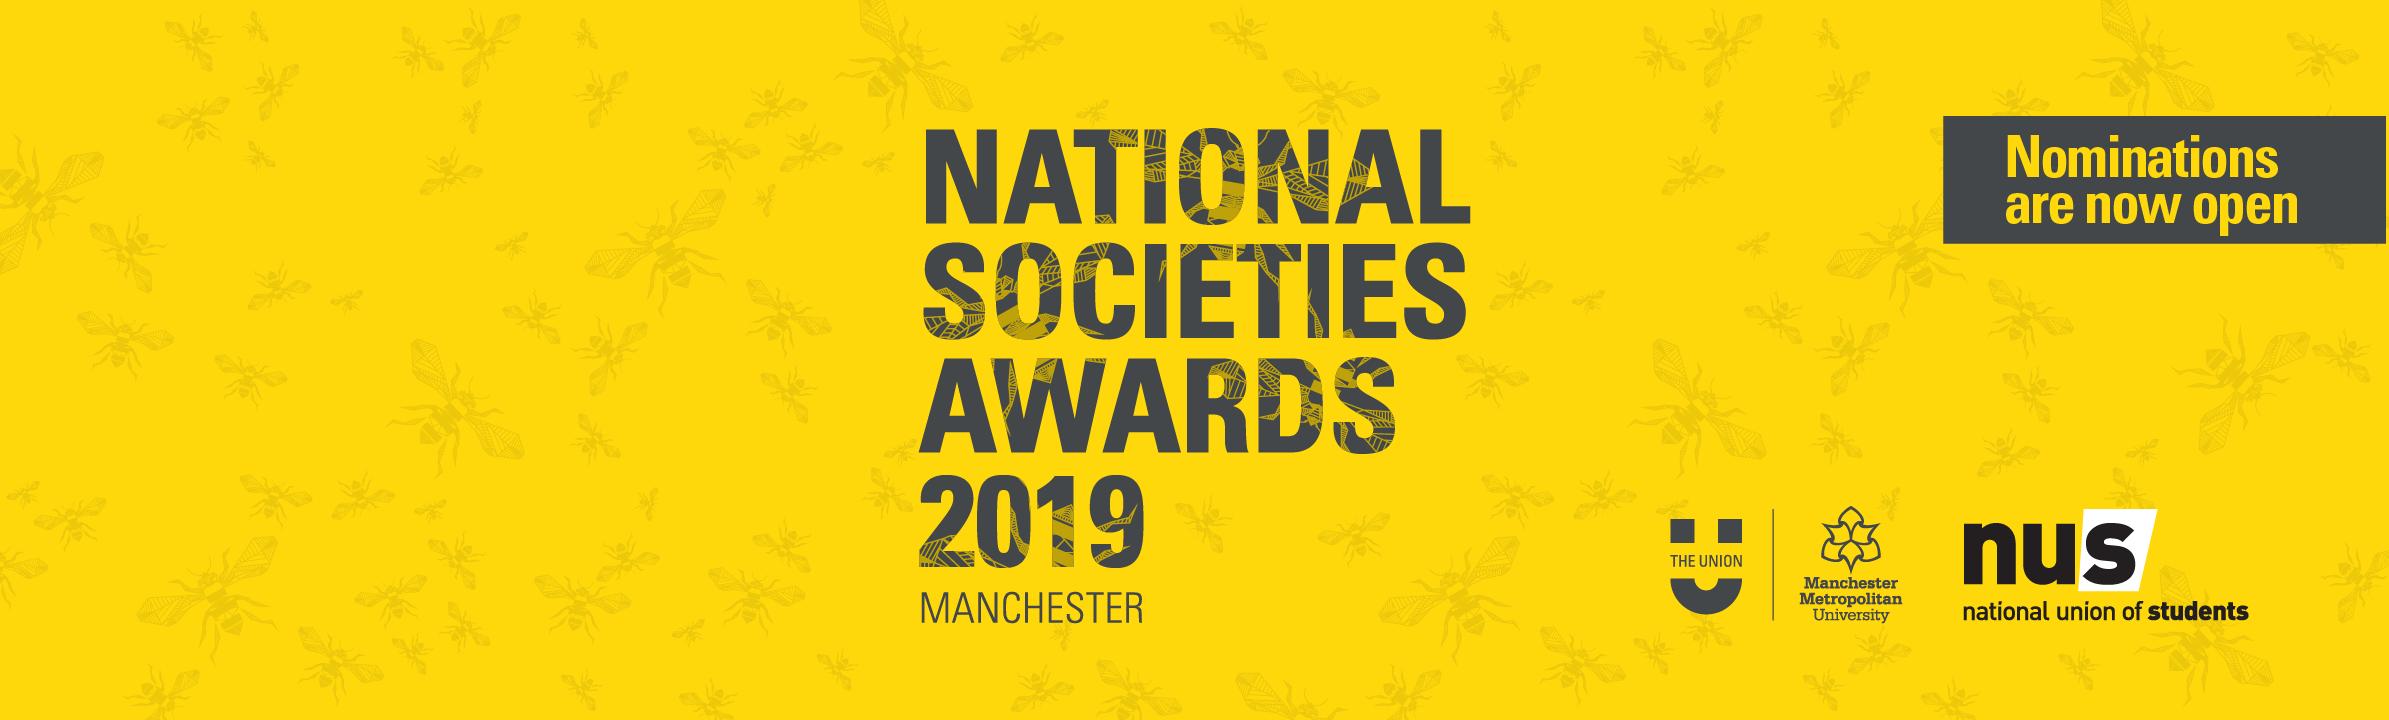 Hp header nsa2019 nominations